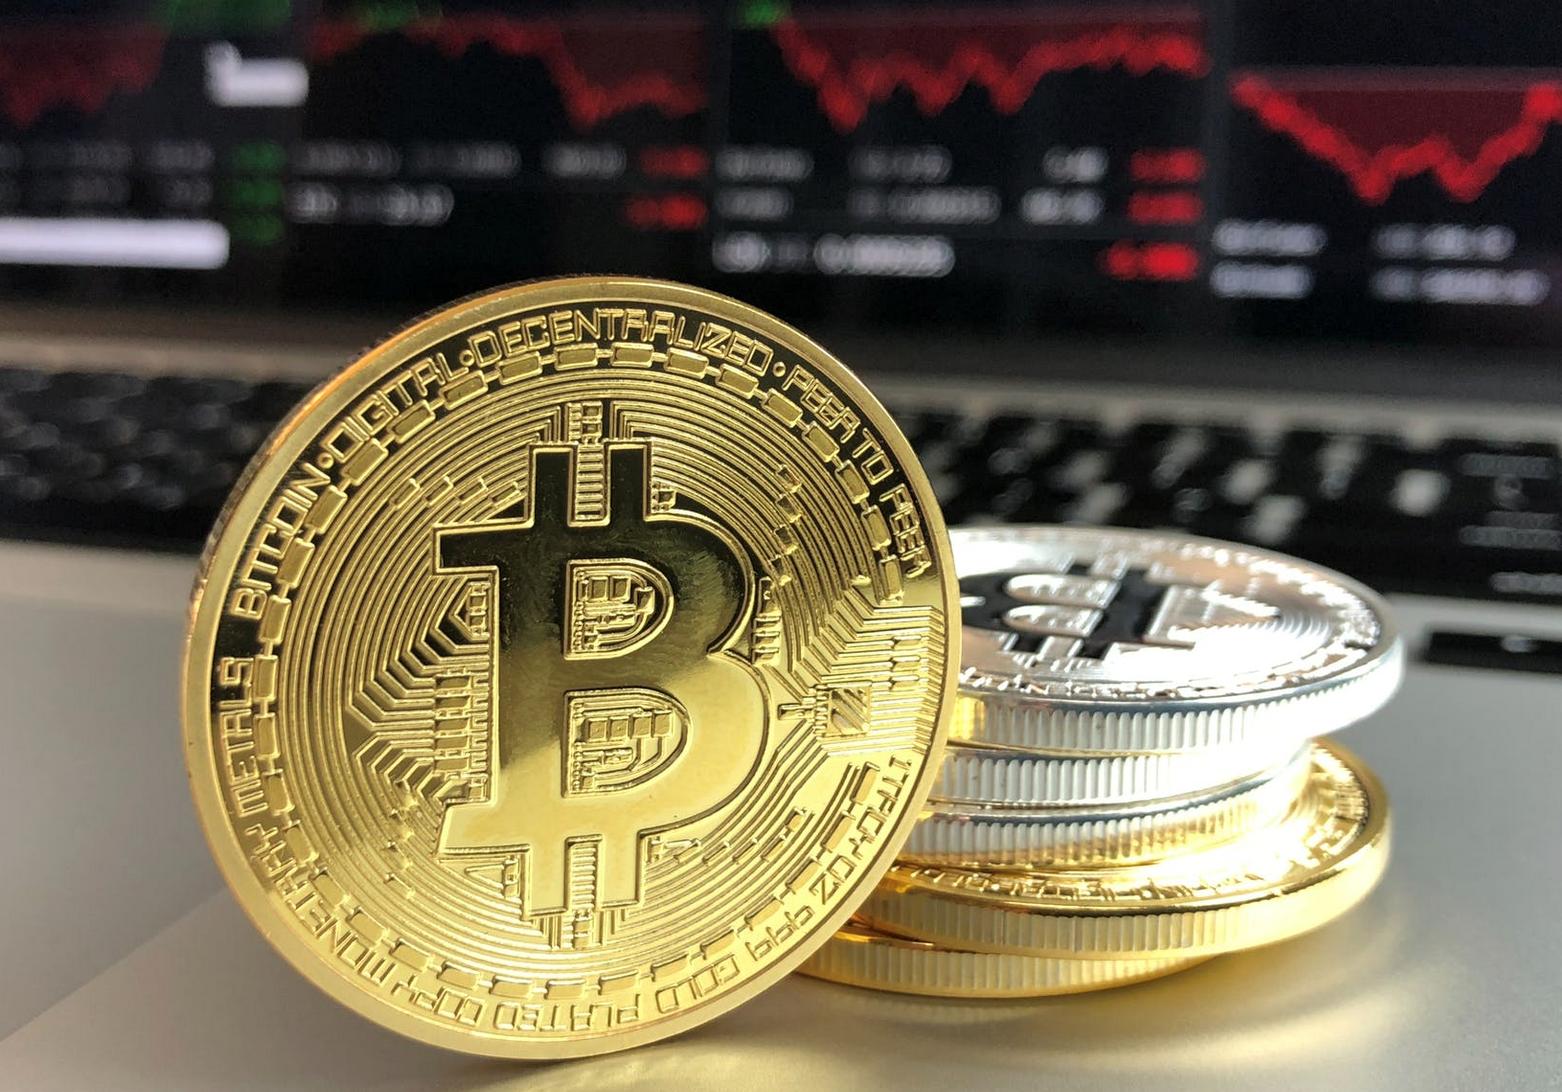 anonymity on the blockchain